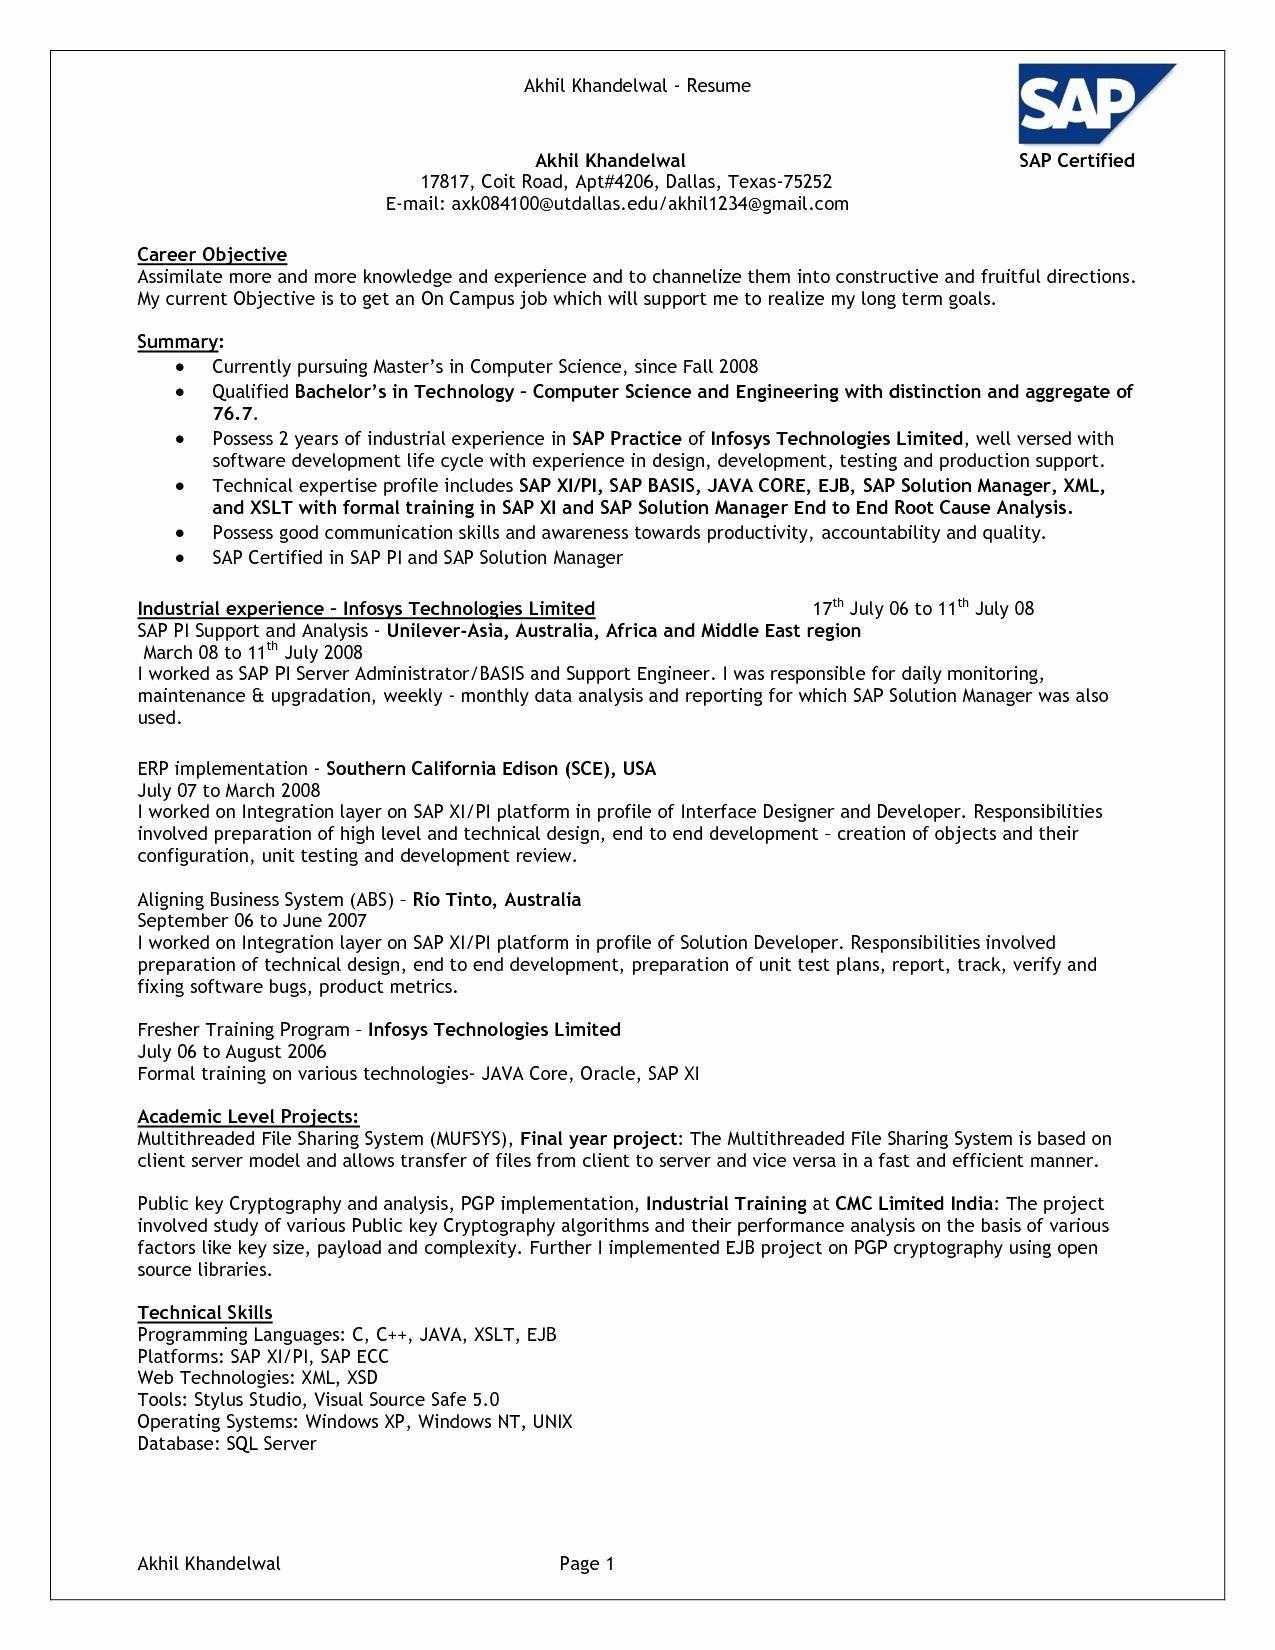 Resume Format Kuwait | Job resume, Resume, Resume format